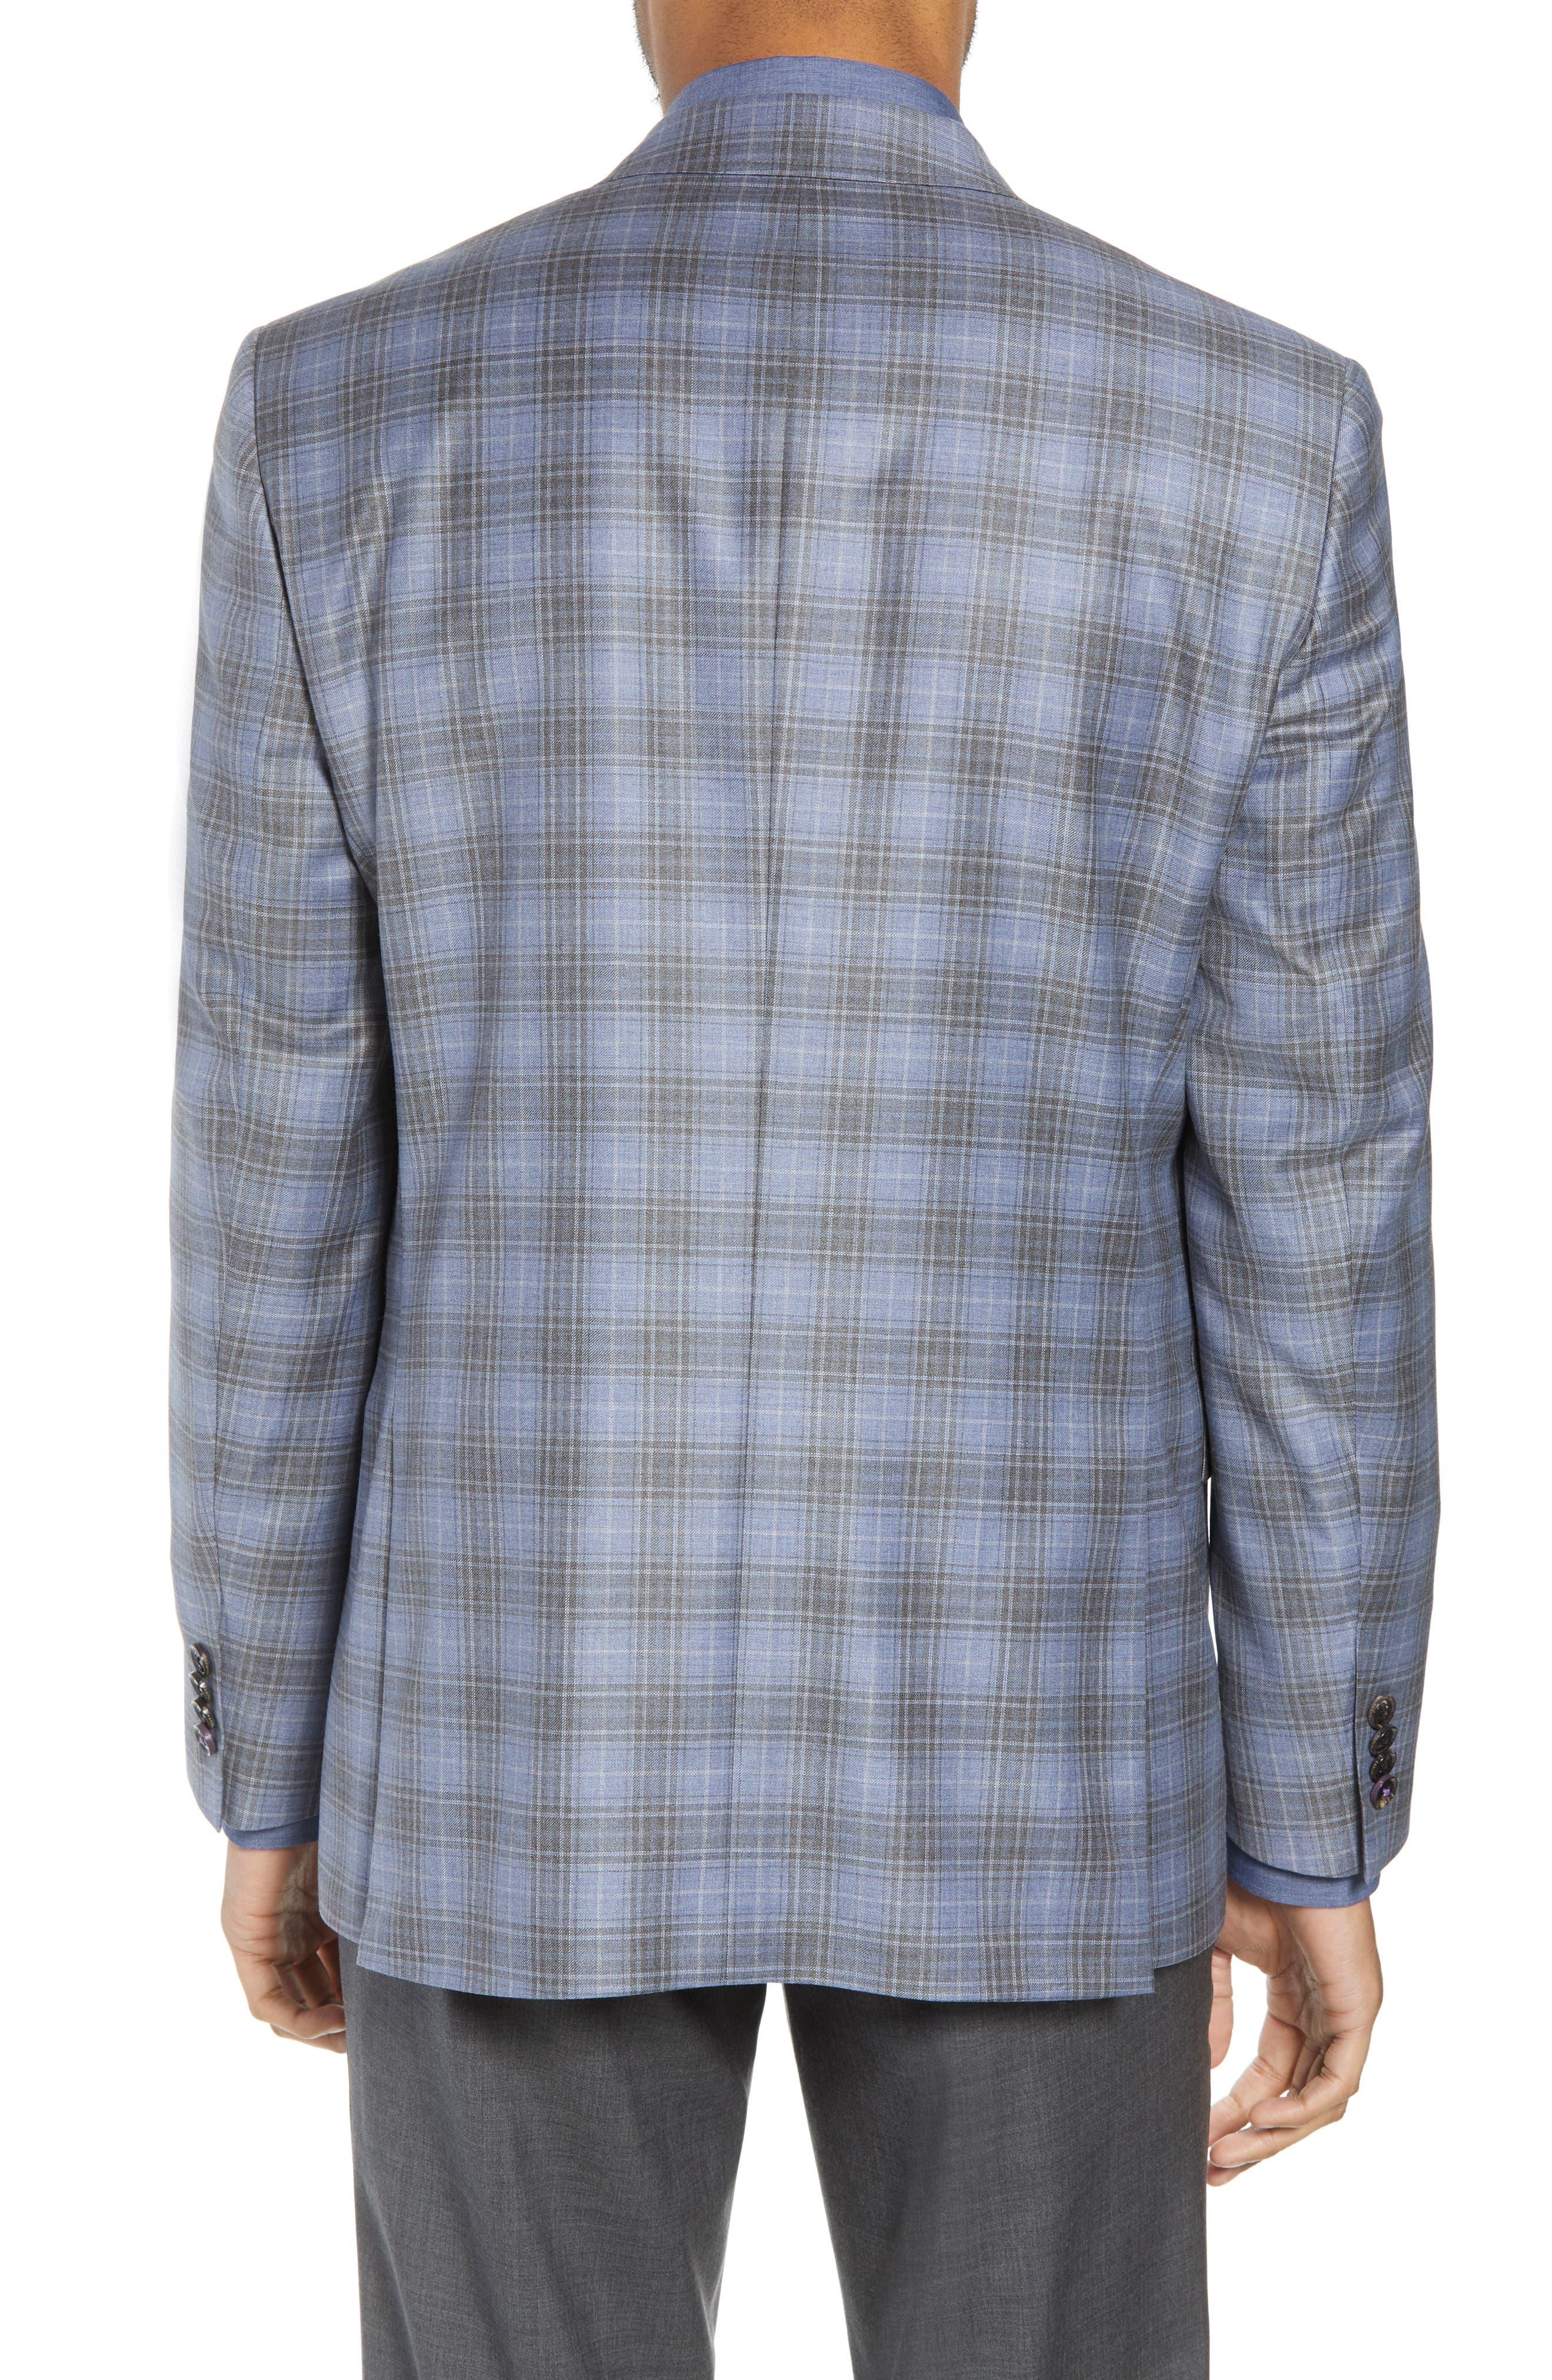 Jay Trim Fit Plaid Wool Sport Coat,                             Alternate thumbnail 2, color,                             400